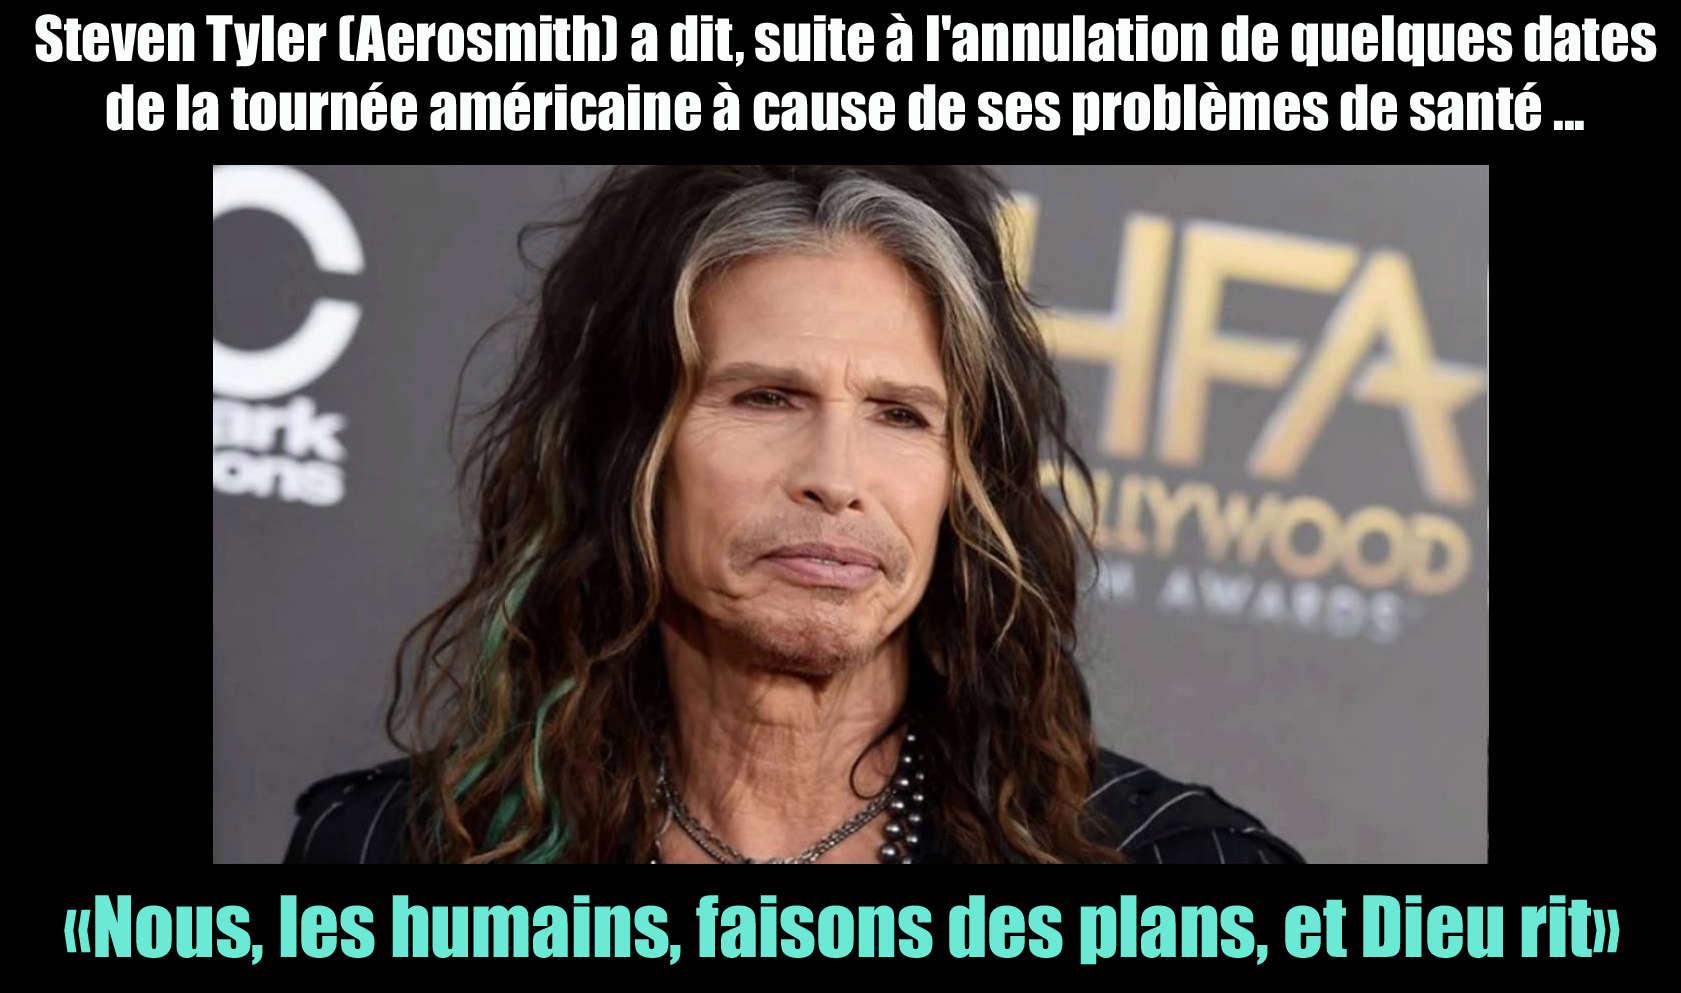 STEVEN TYLER (Aerosmith) a dit ... en bon philosophe qu'il est ... Steven10